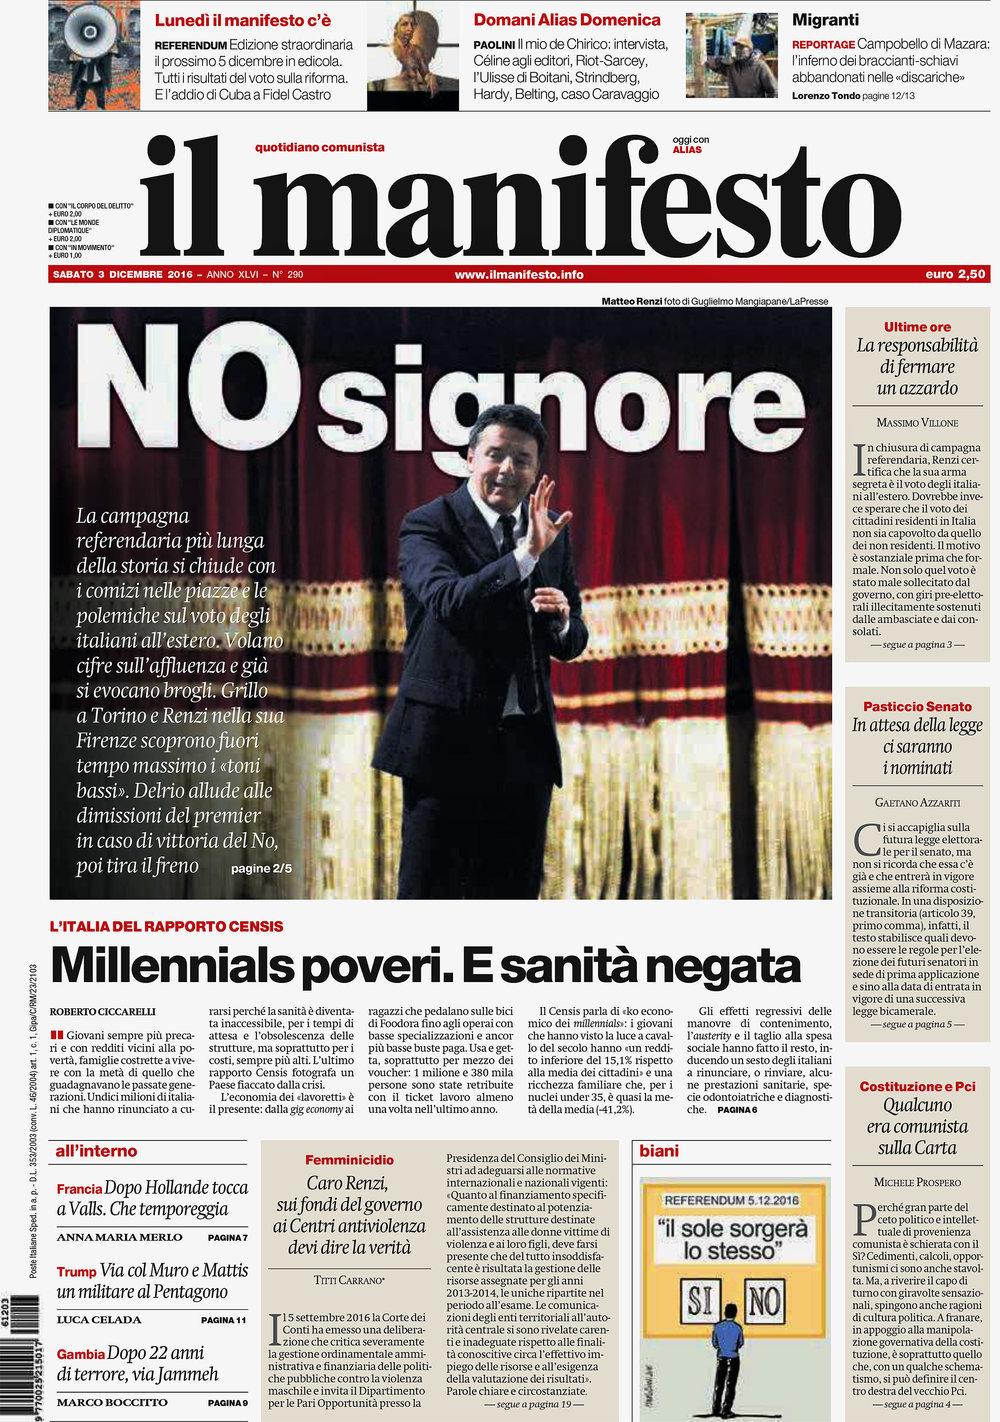 Il Manifesto — December 3, 2016